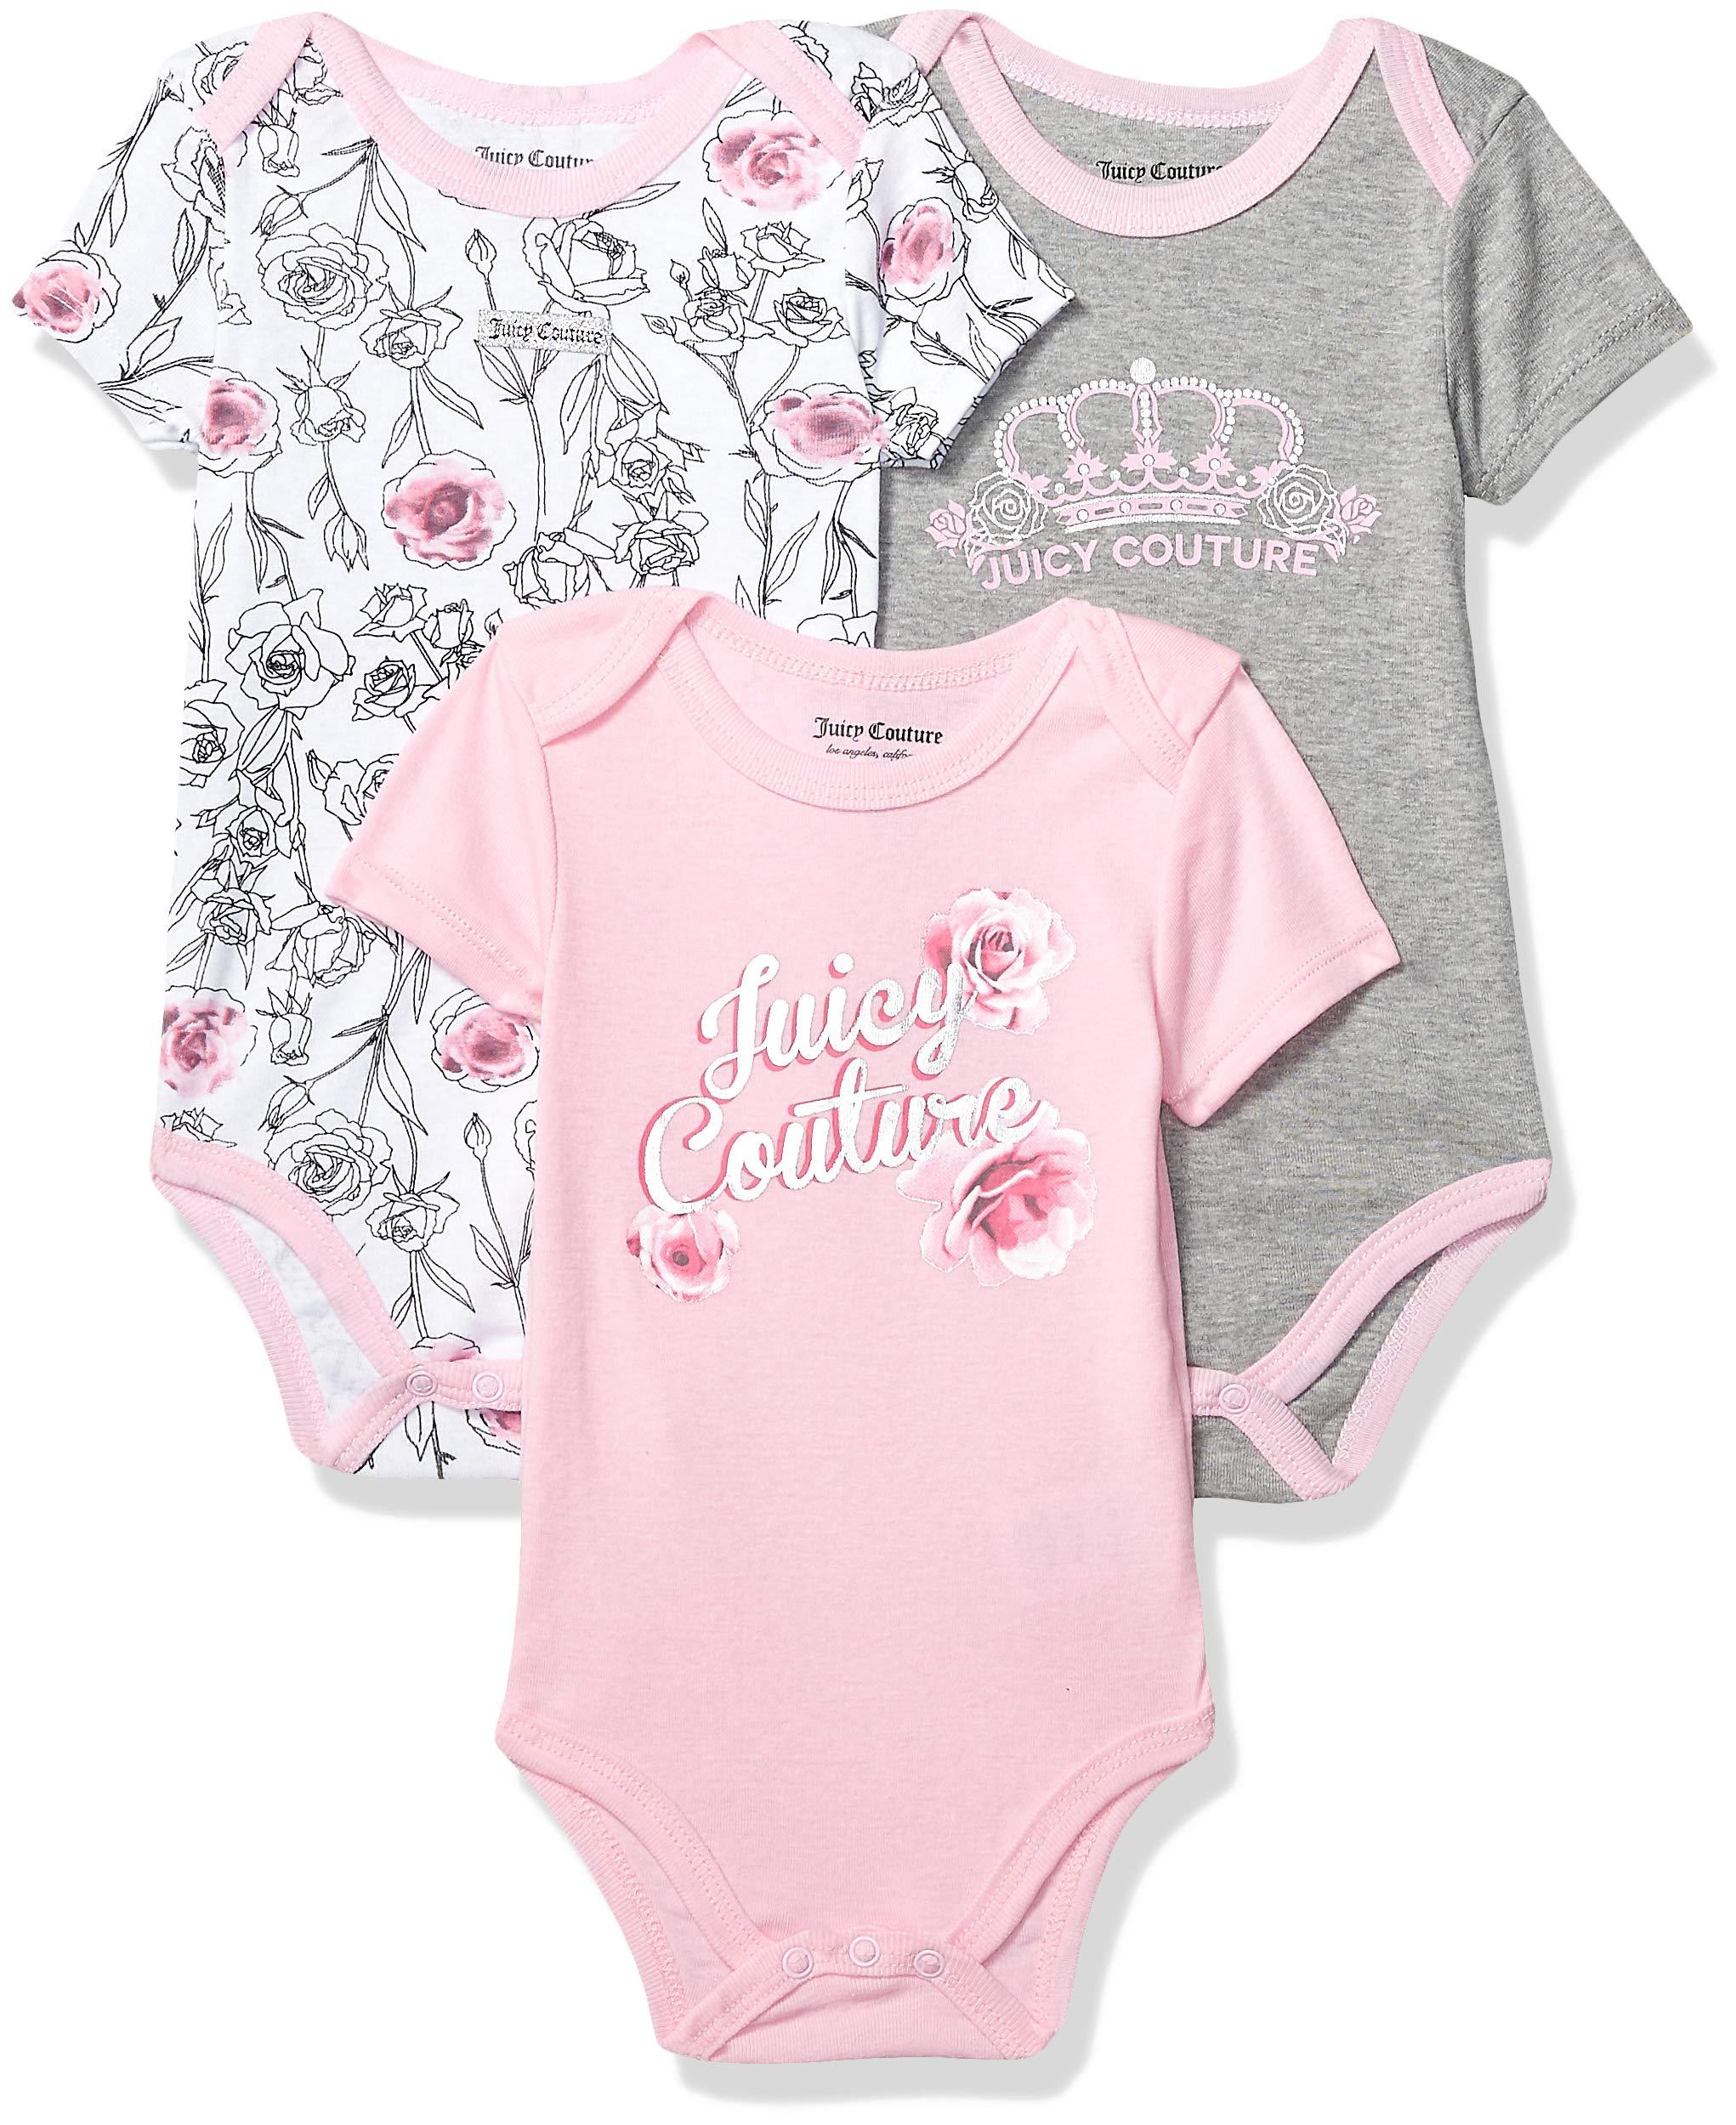 Juicy Couture 女婴连体衣 3 件套